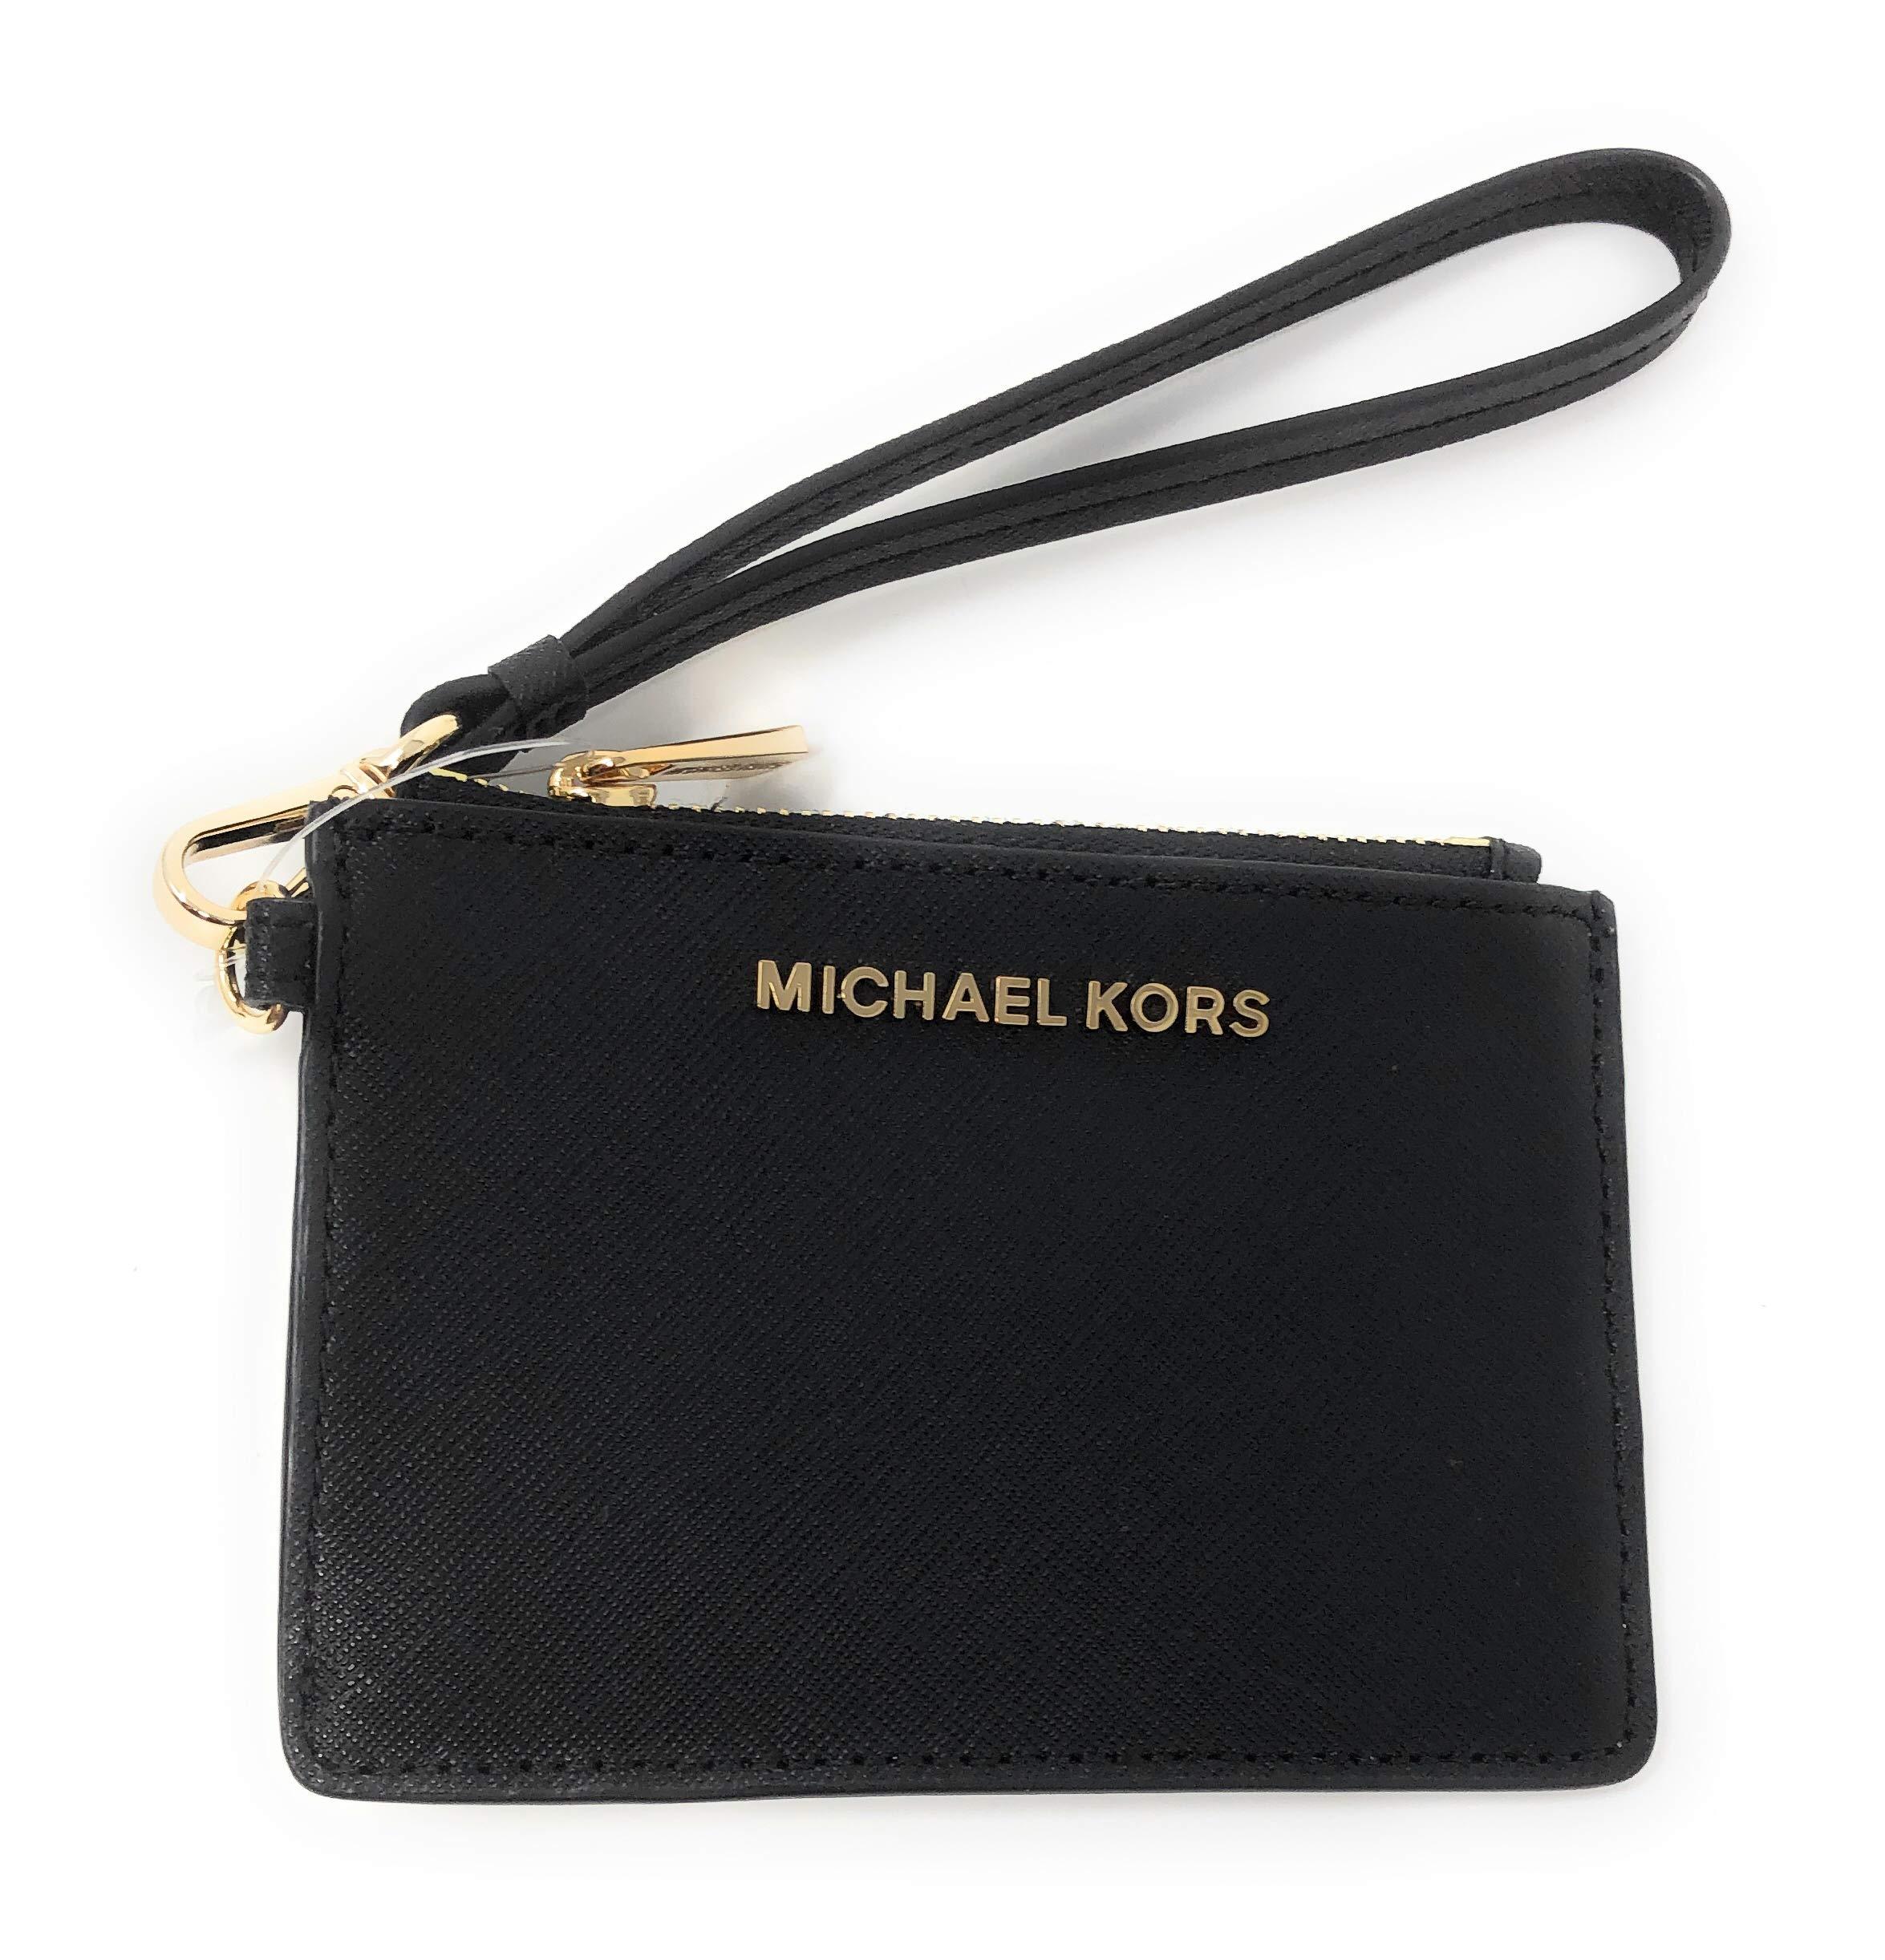 Michael Kors Jet Set Travel Top Zip Coin Pouch ID Card Case Wallet Wristlet (Black)